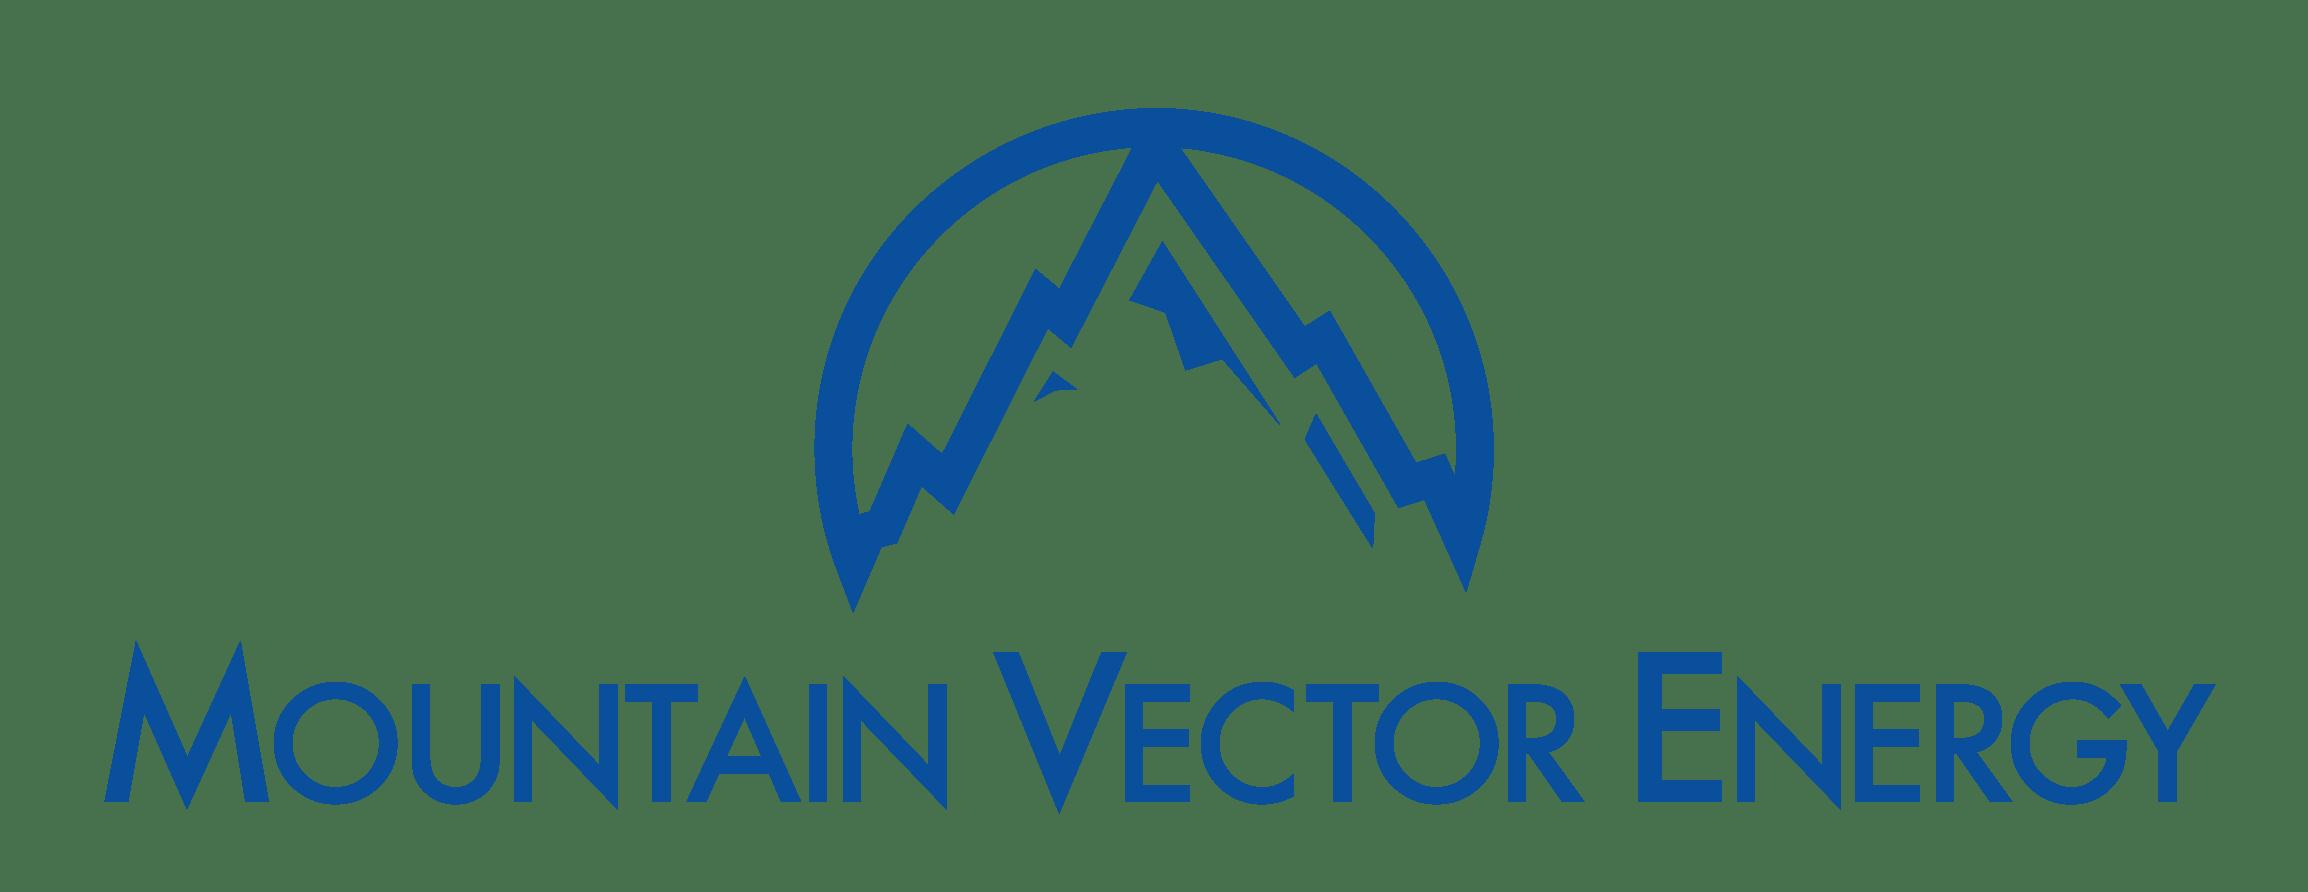 Logo for Mountain Vector Energy a real time energy data company